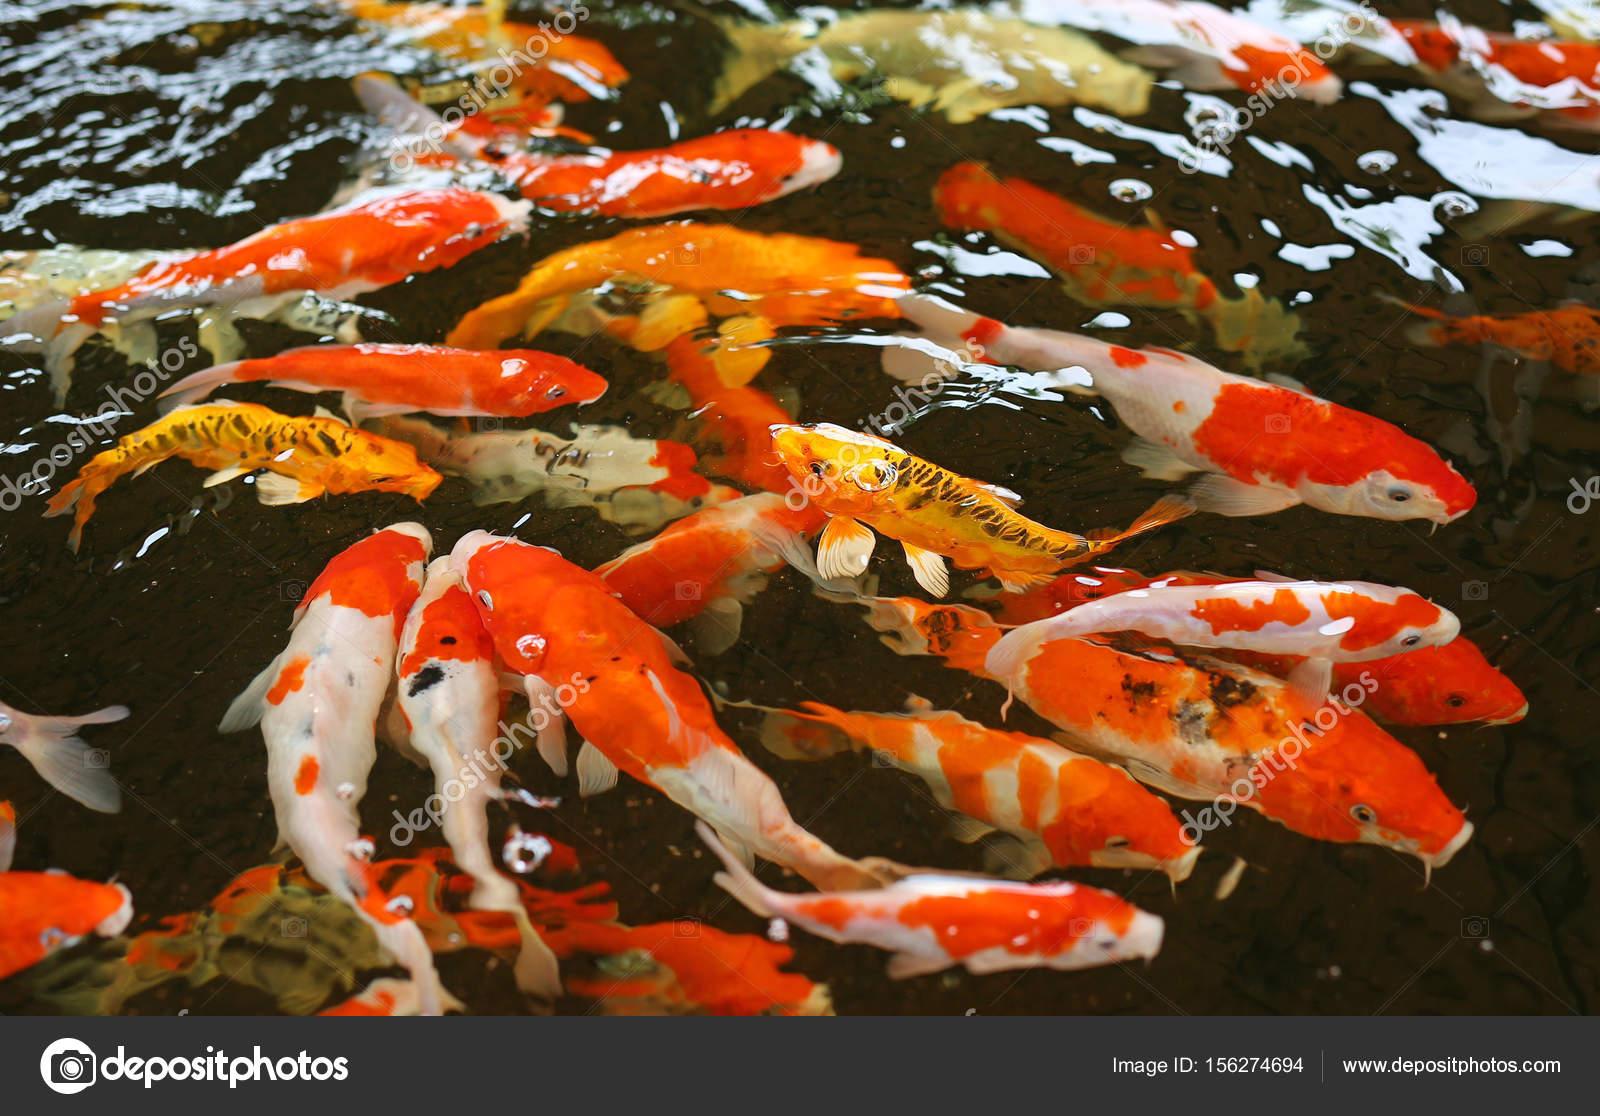 Koi carpas pescados japoneses nataci n cyprinus carpio for Alimento para carpas koi